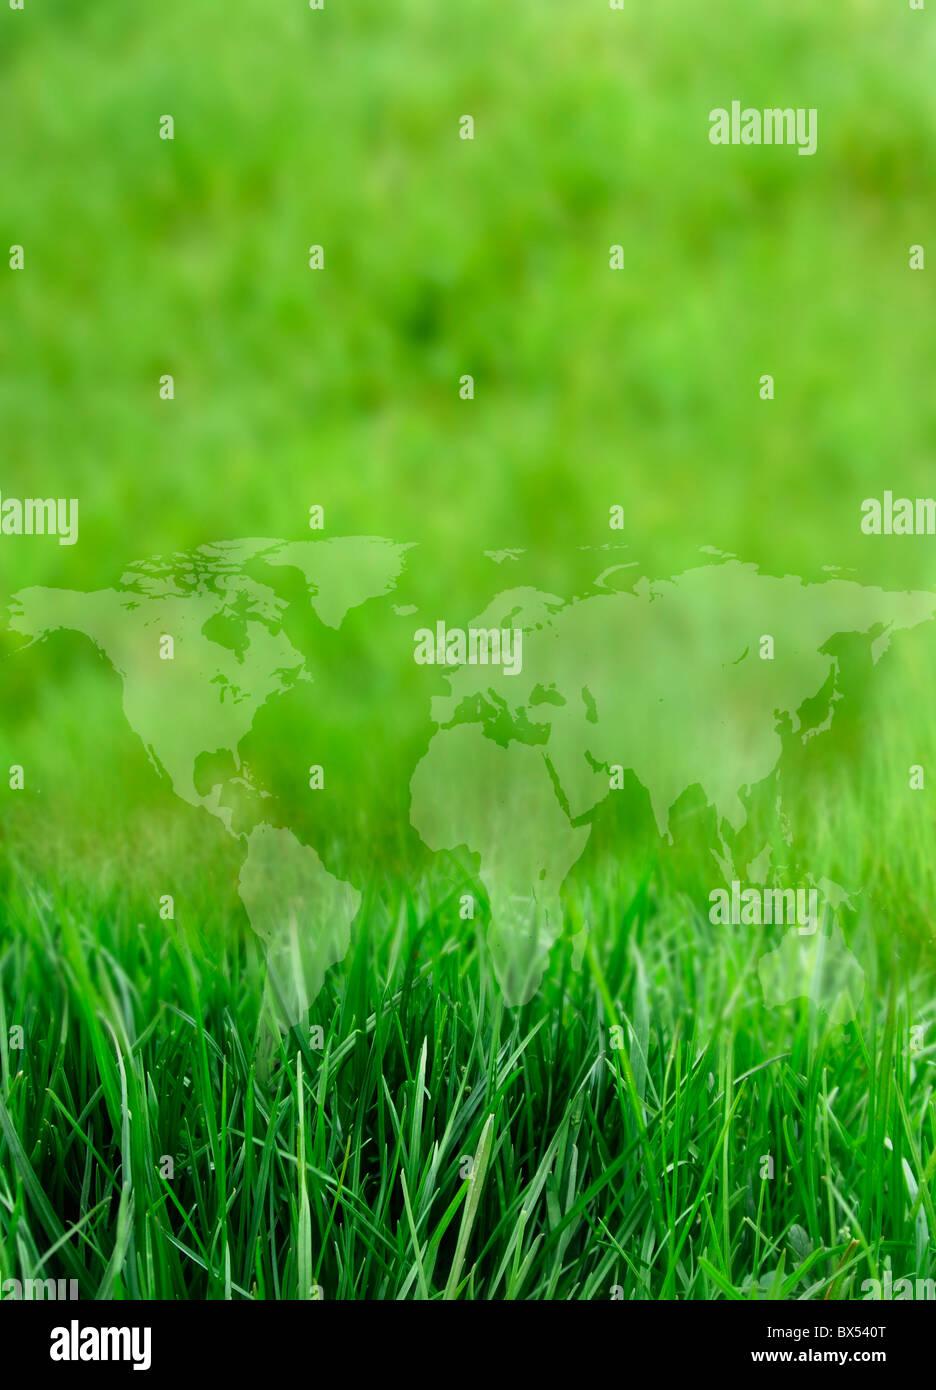 Planeta verde, obra conceptual Imagen De Stock